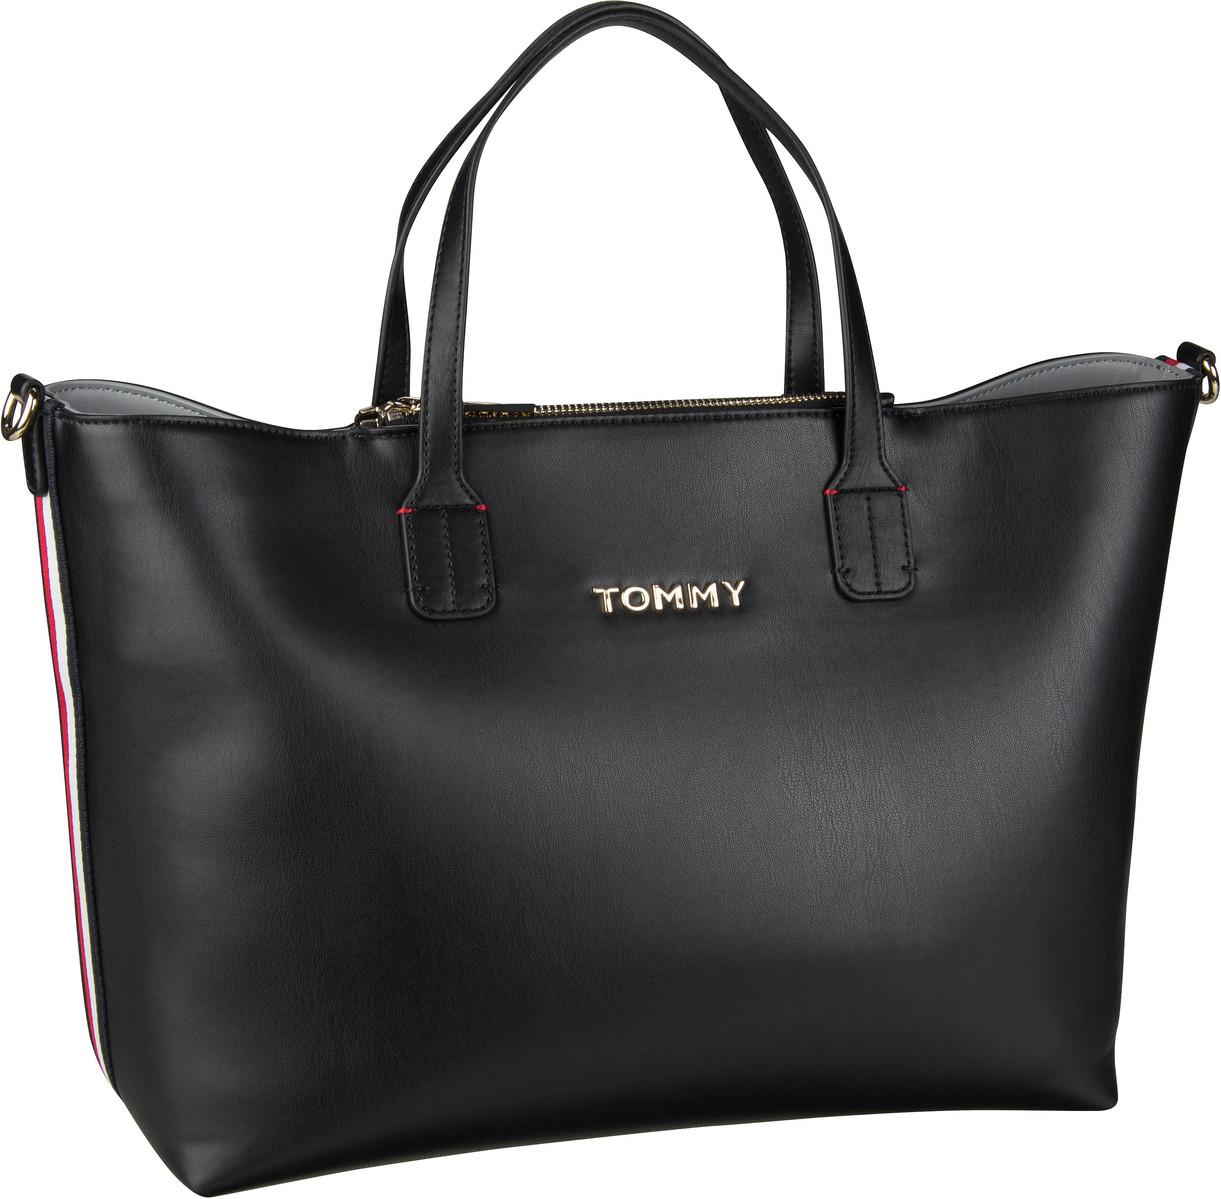 Handtasche Iconic Tommy Satchel Black